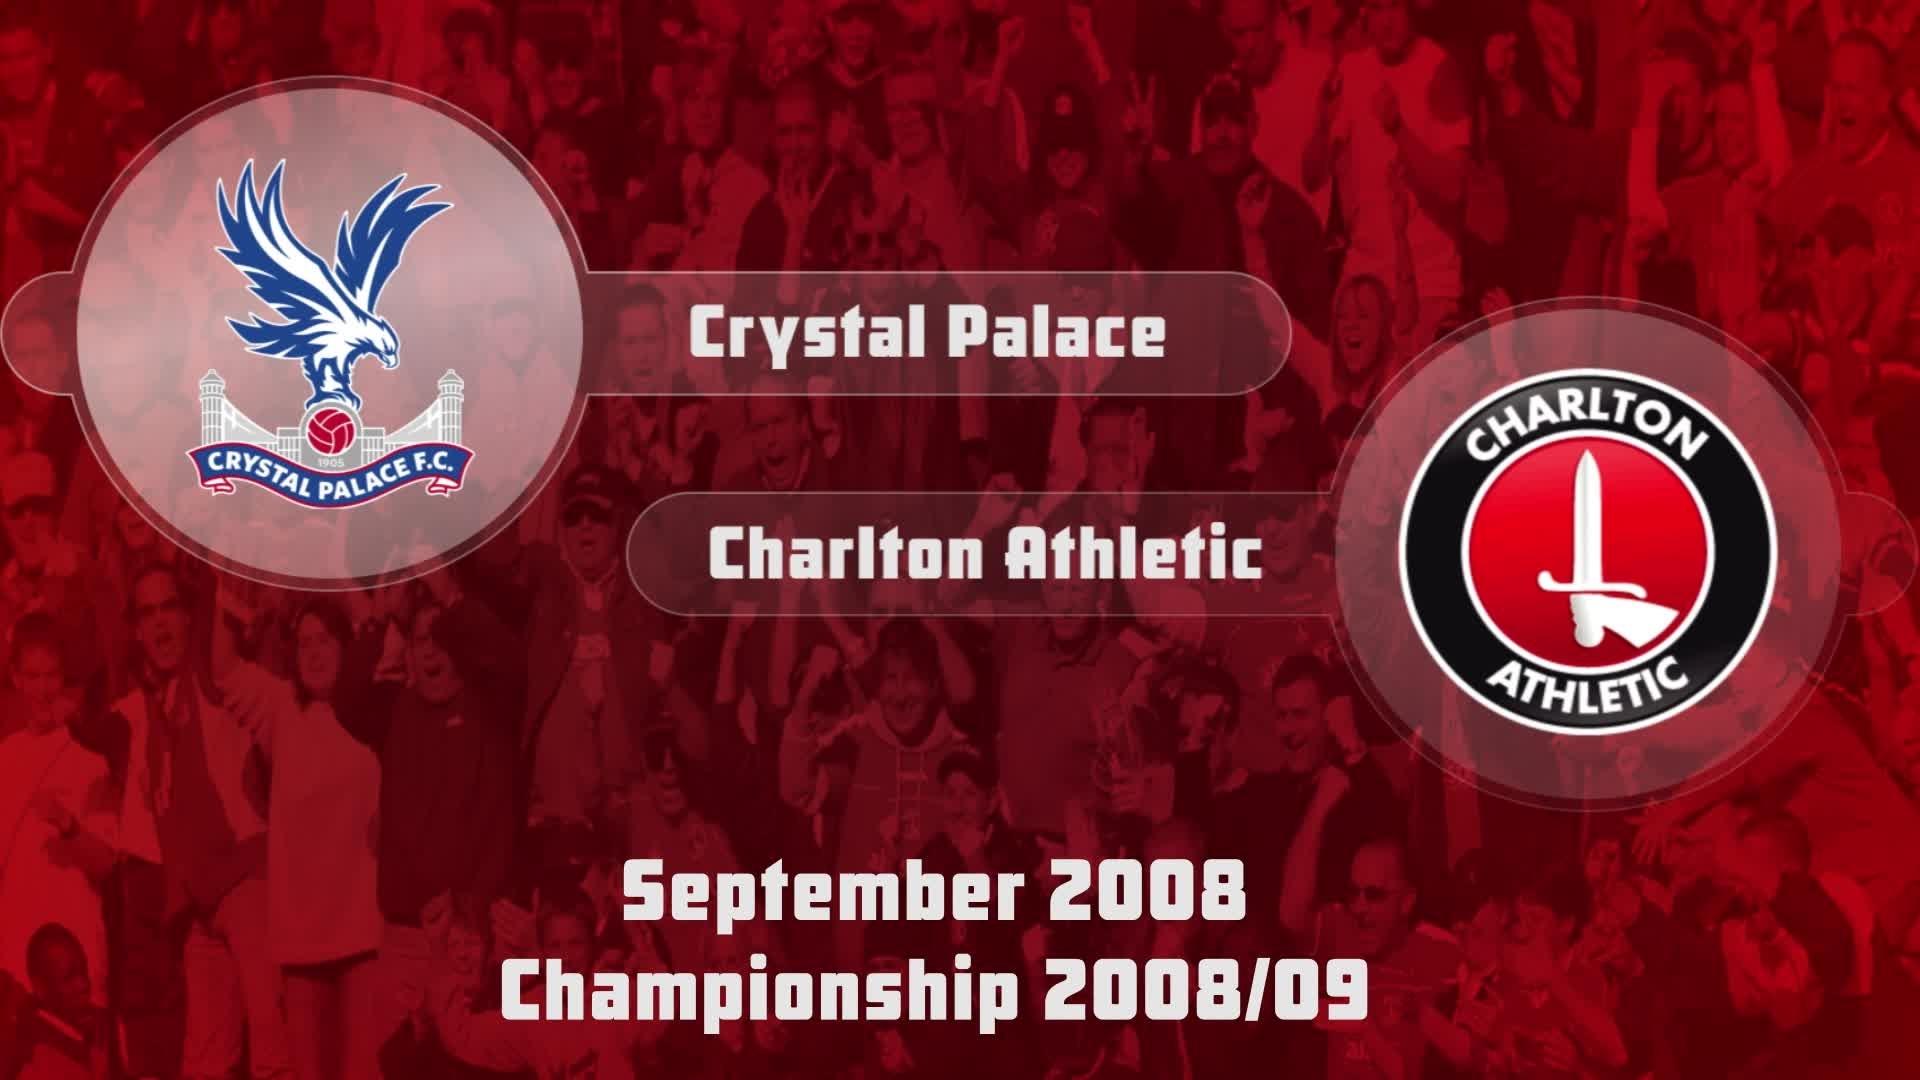 10 HIGHLIGHTS | Crystal Palace 1 Charlton 0 (Sept 2008)